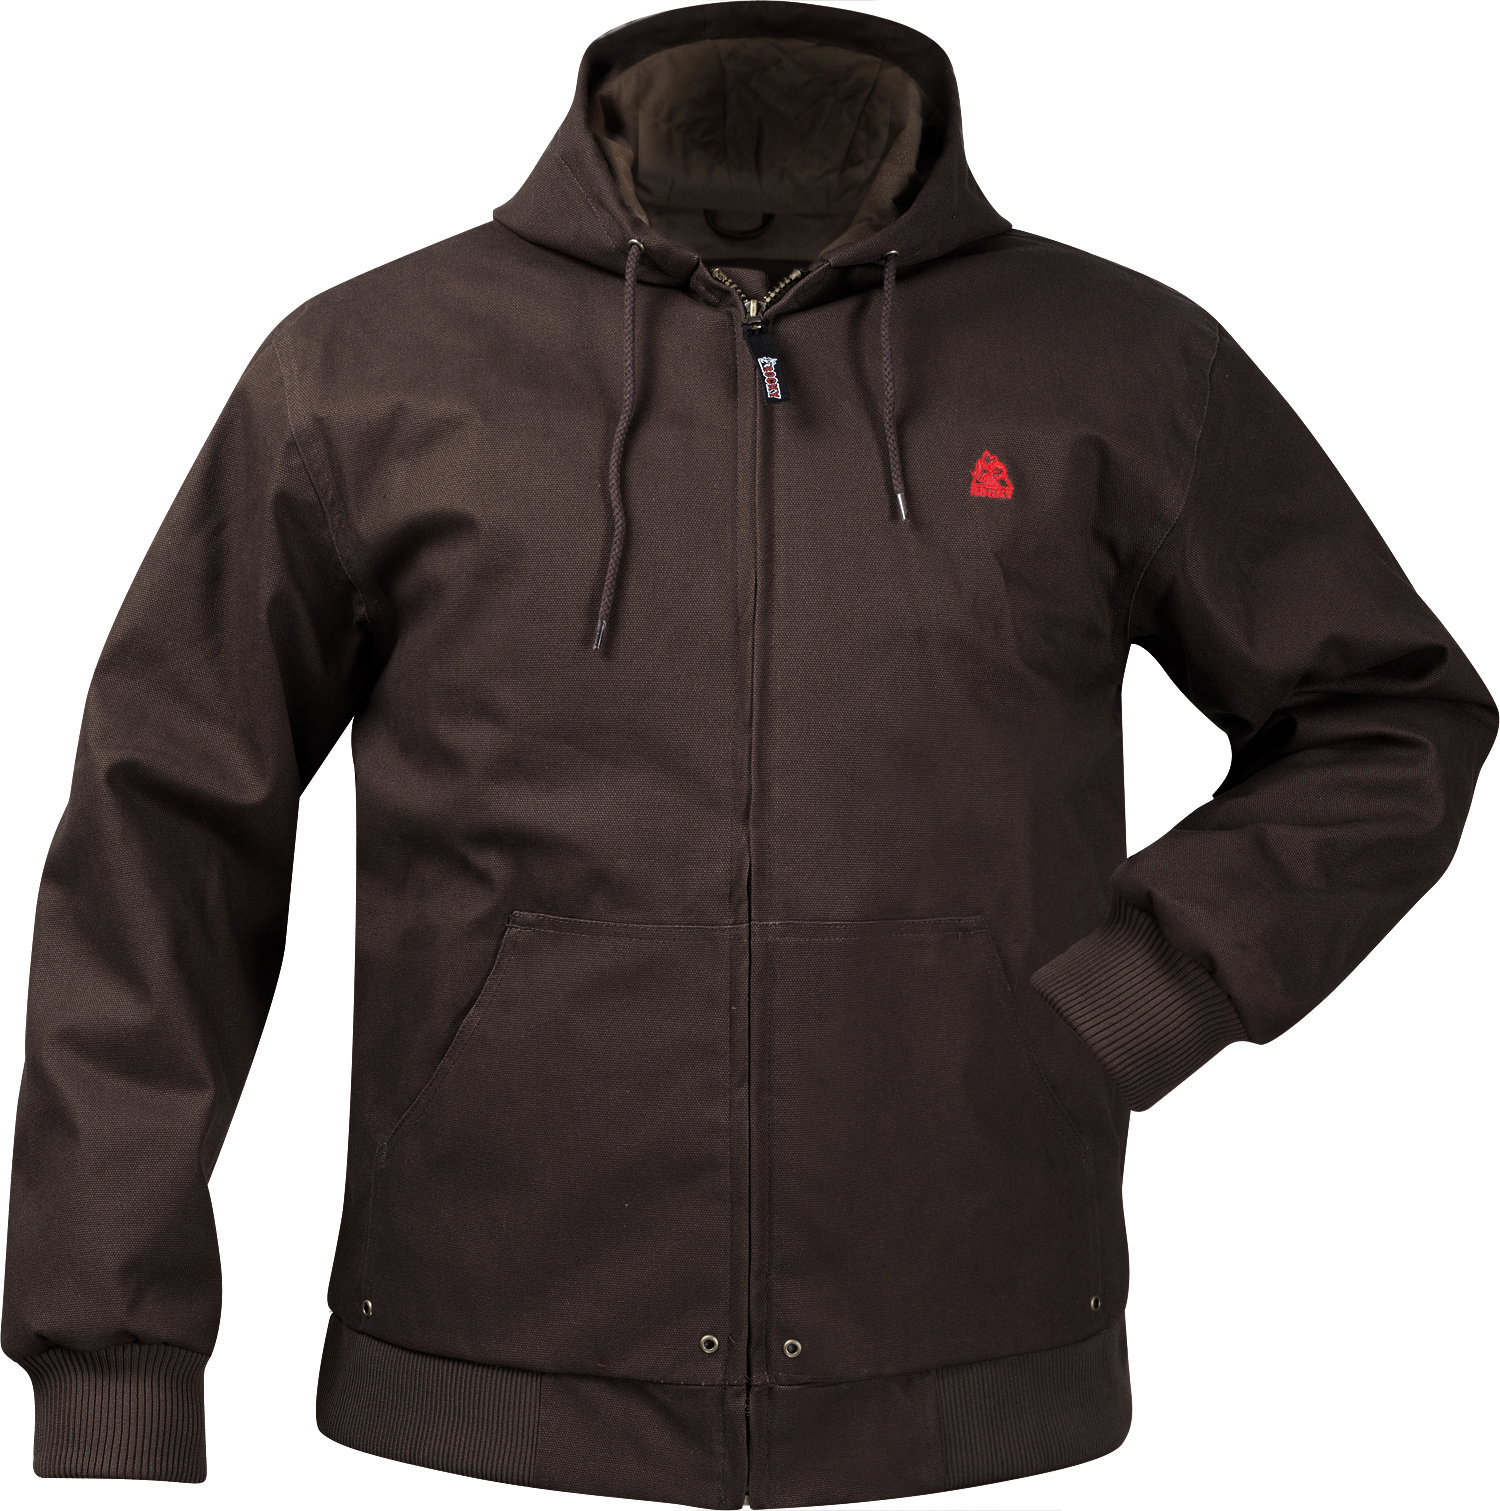 Men's Waterproof Insulated Hooded Work Jacket